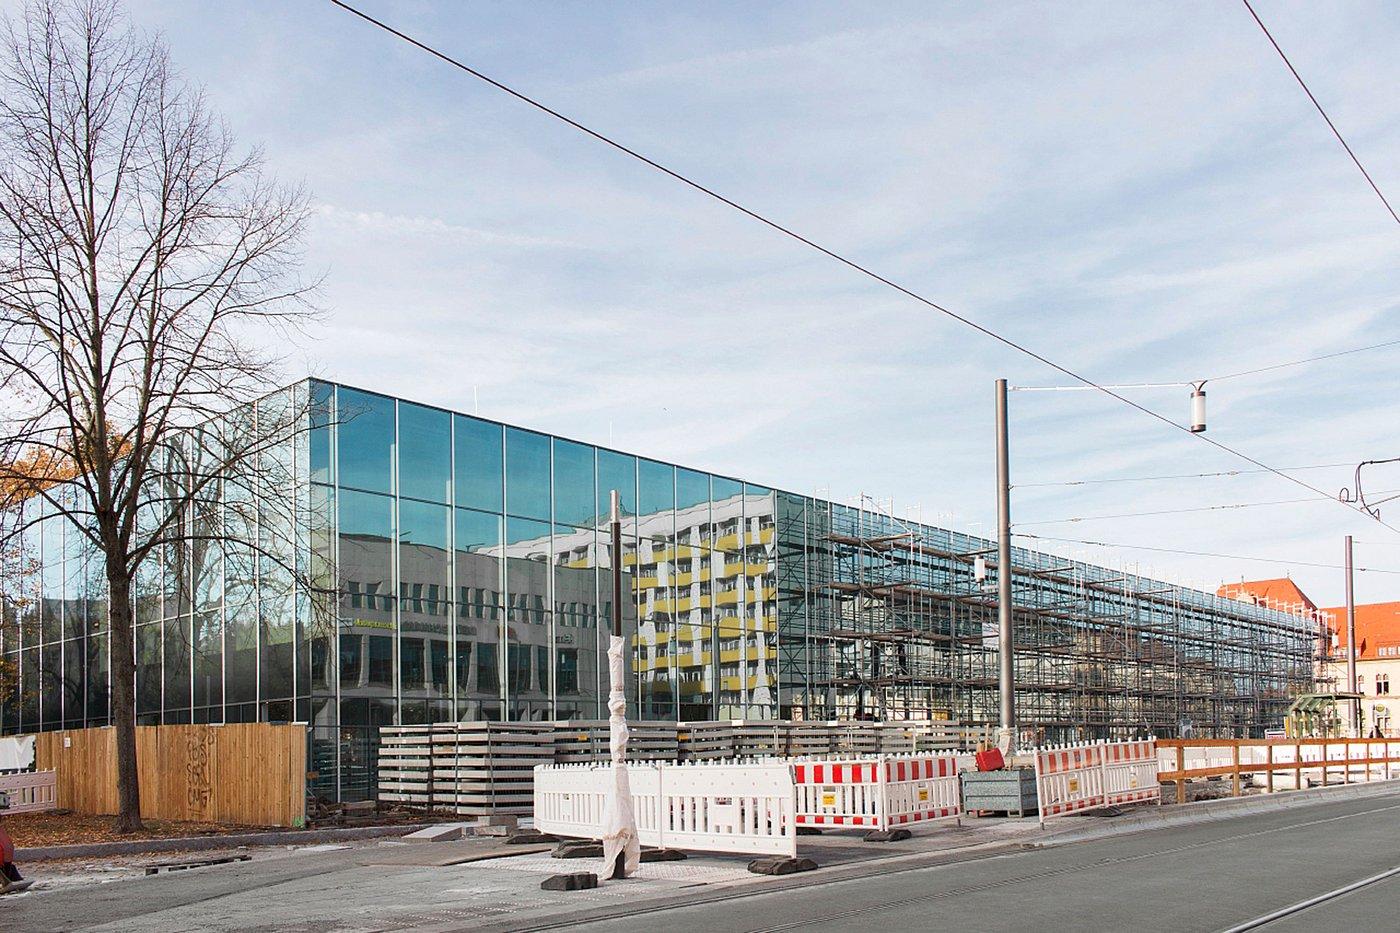 Bauhaus Museum Dessau 2019 Bauhaus Museum Dessau Stiftung